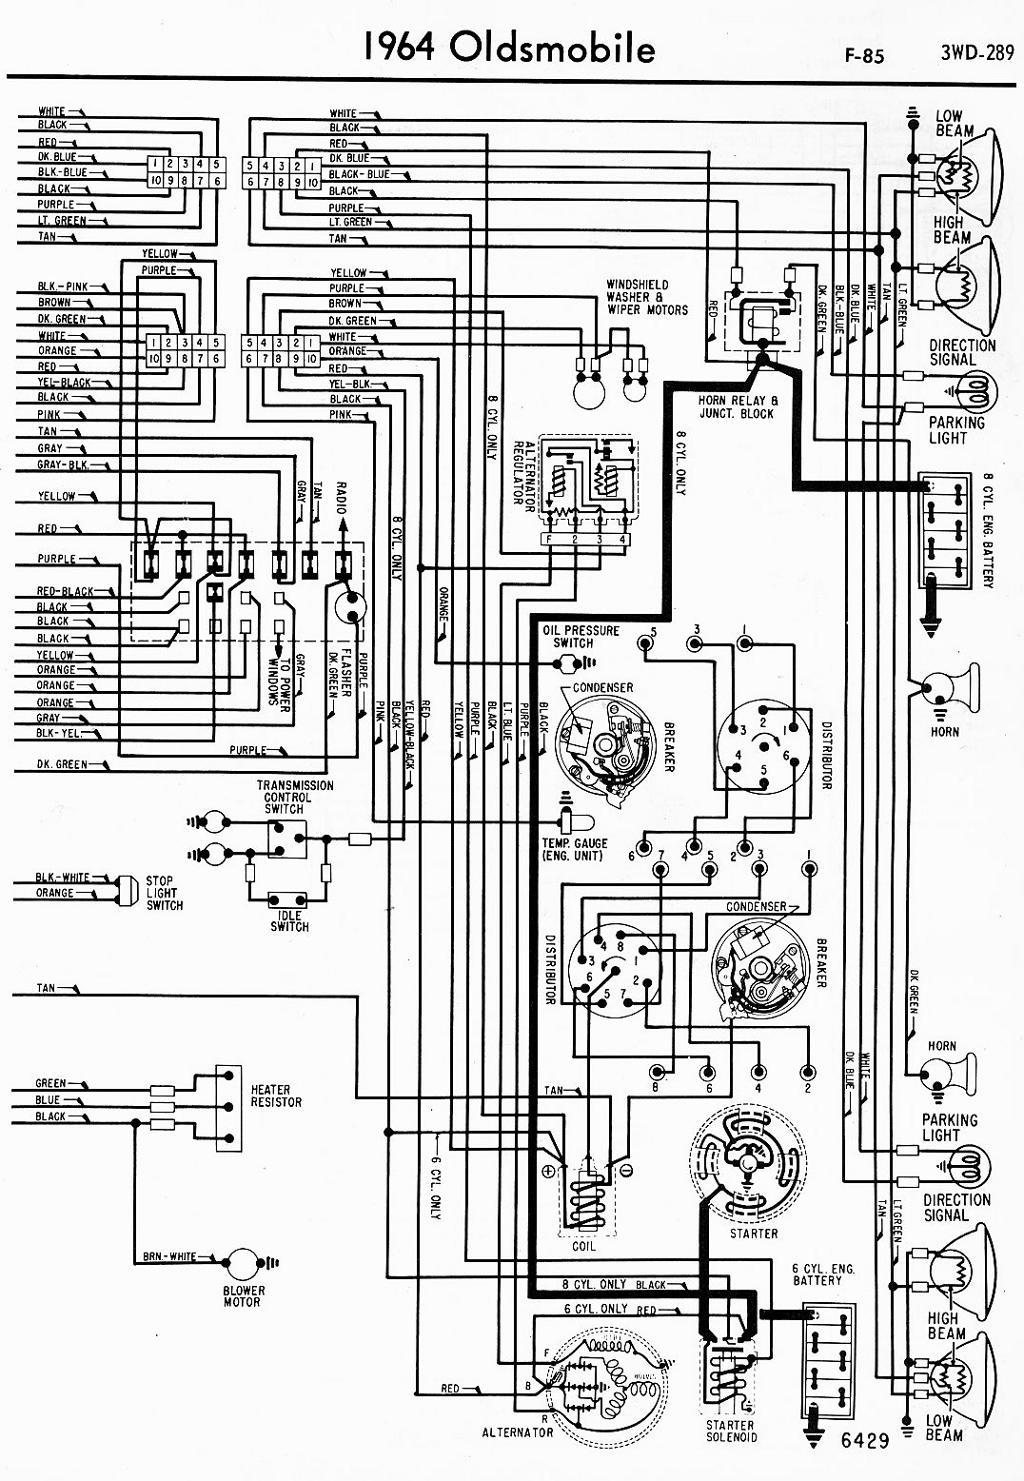 small resolution of 1967 oldsmobile toronado wiring diagram wiring library rh 50 skriptoase de 1968 oldsmobile cutlass wiring